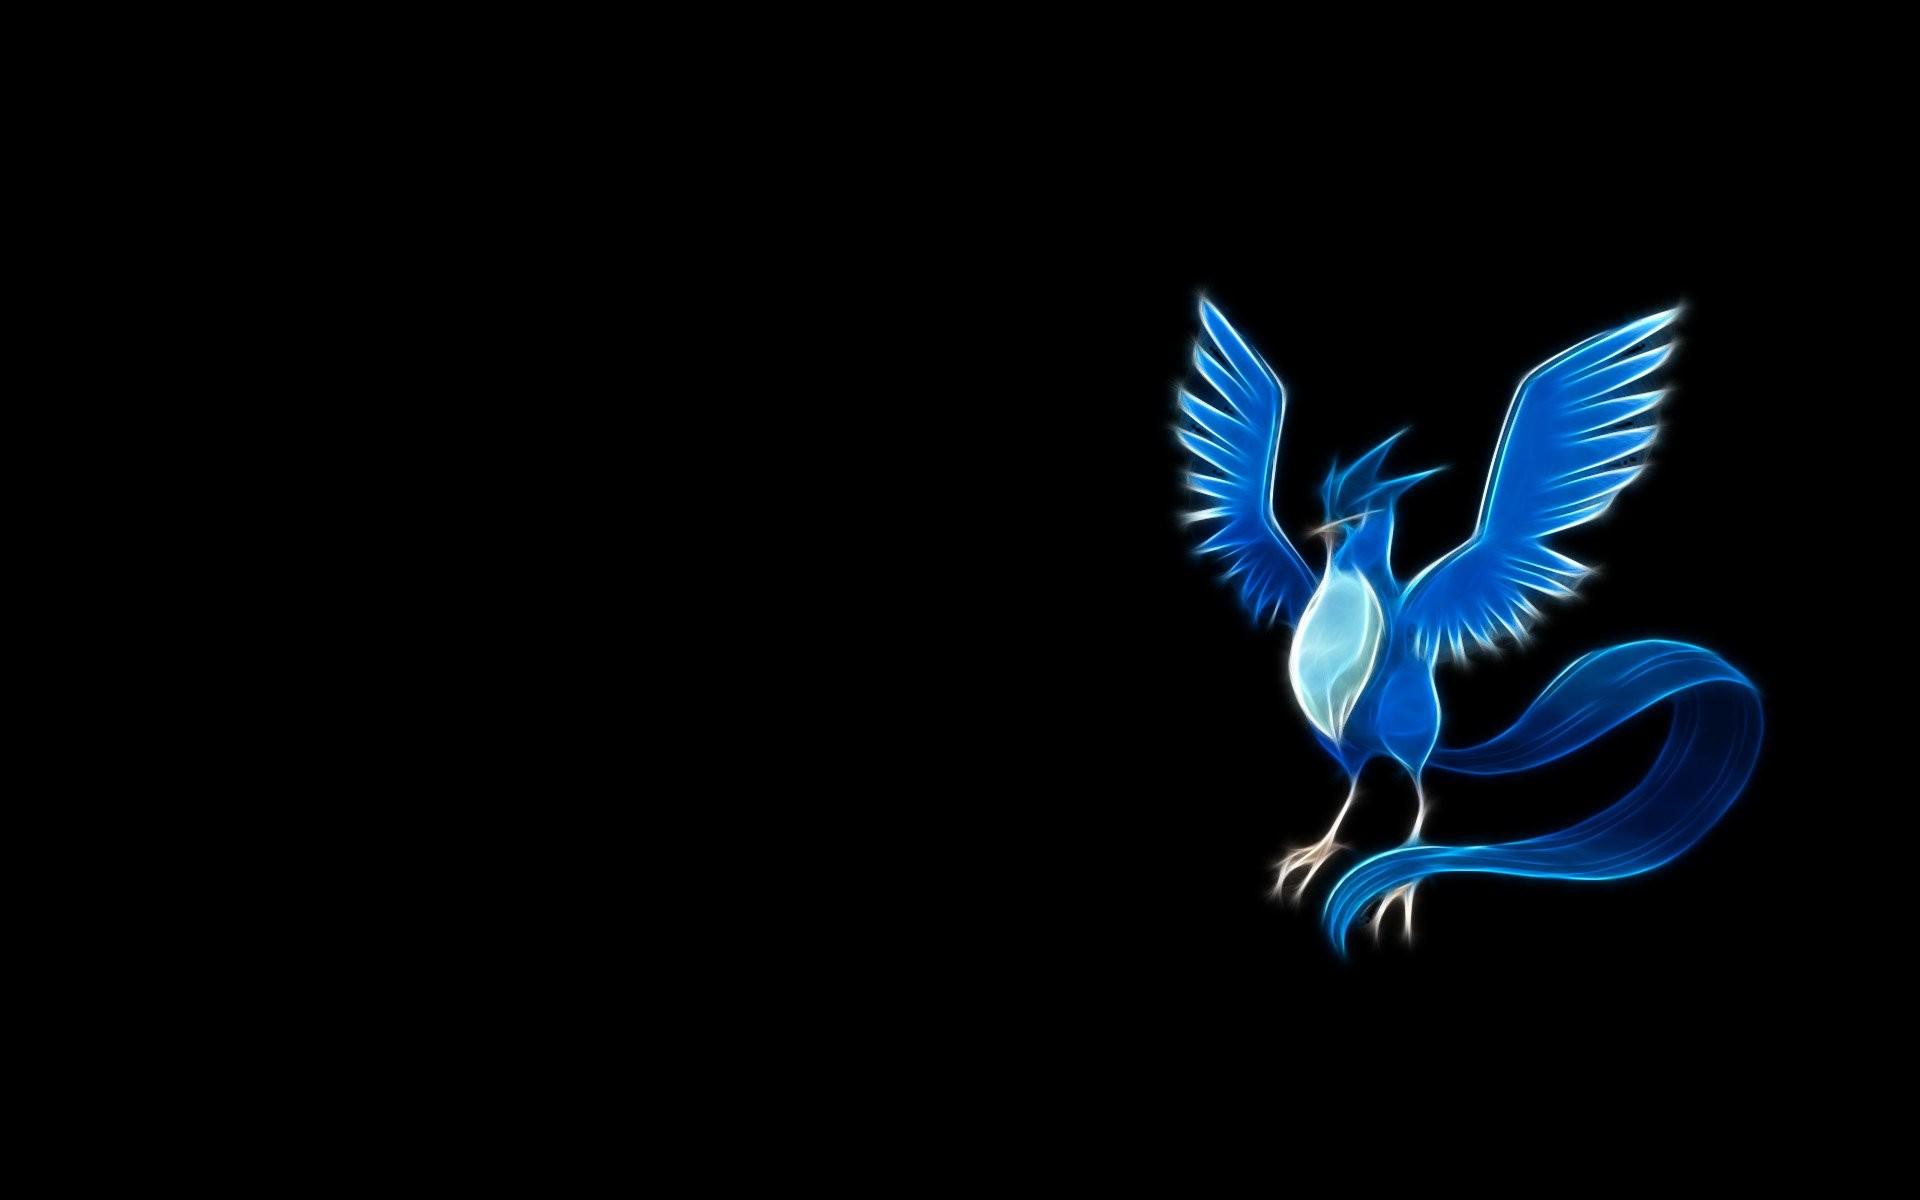 Anime РPok̩mon Articuno (Pok̩mon) Flying Pok̩mon Legendary Pok̩mon  Wallpaper